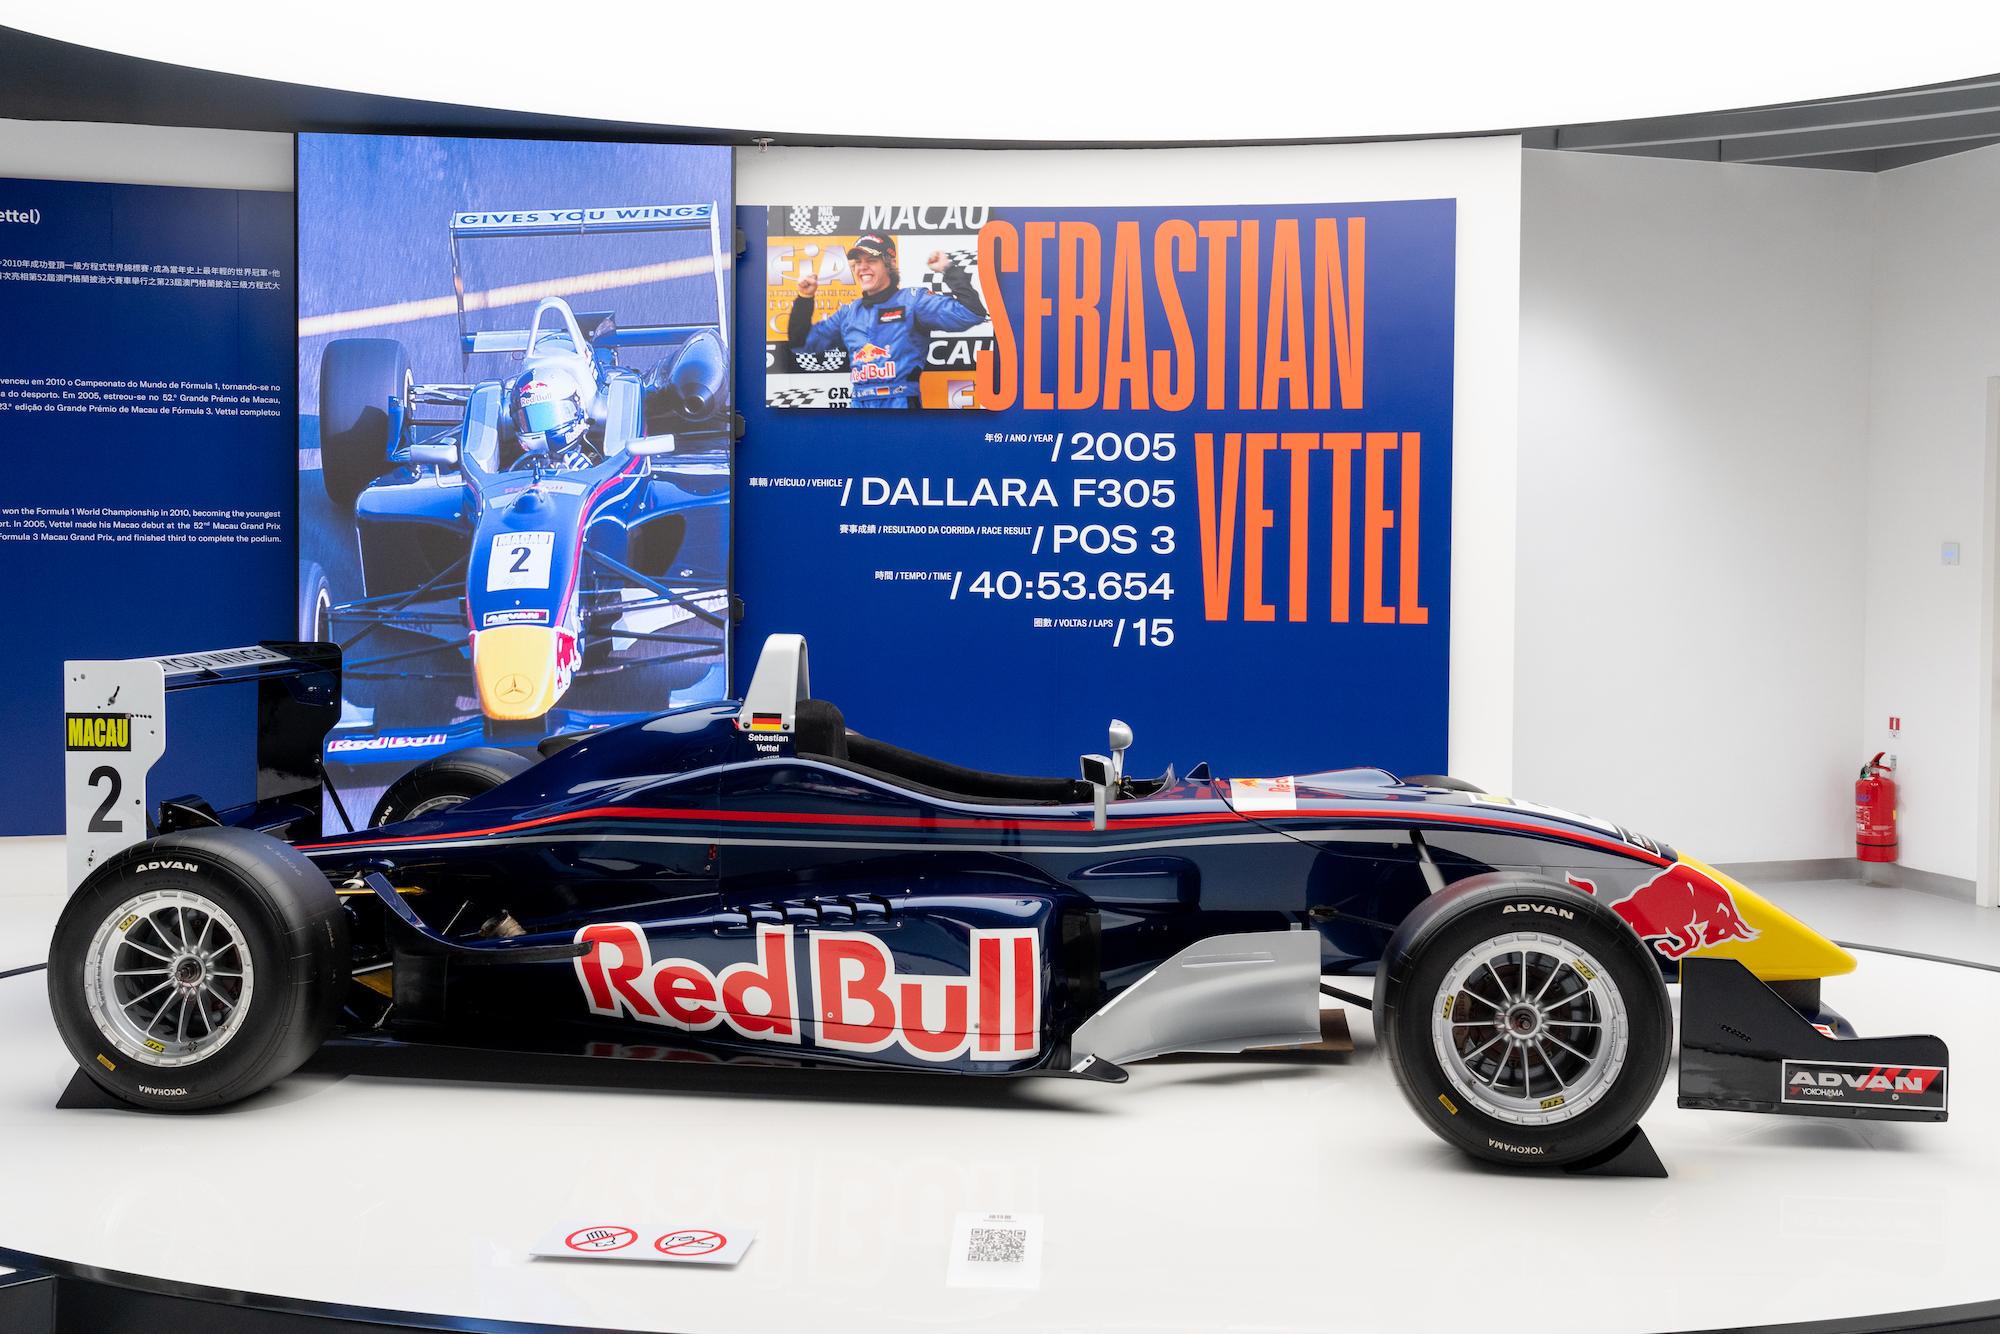 Sebastian Vetttel's Dallara F305